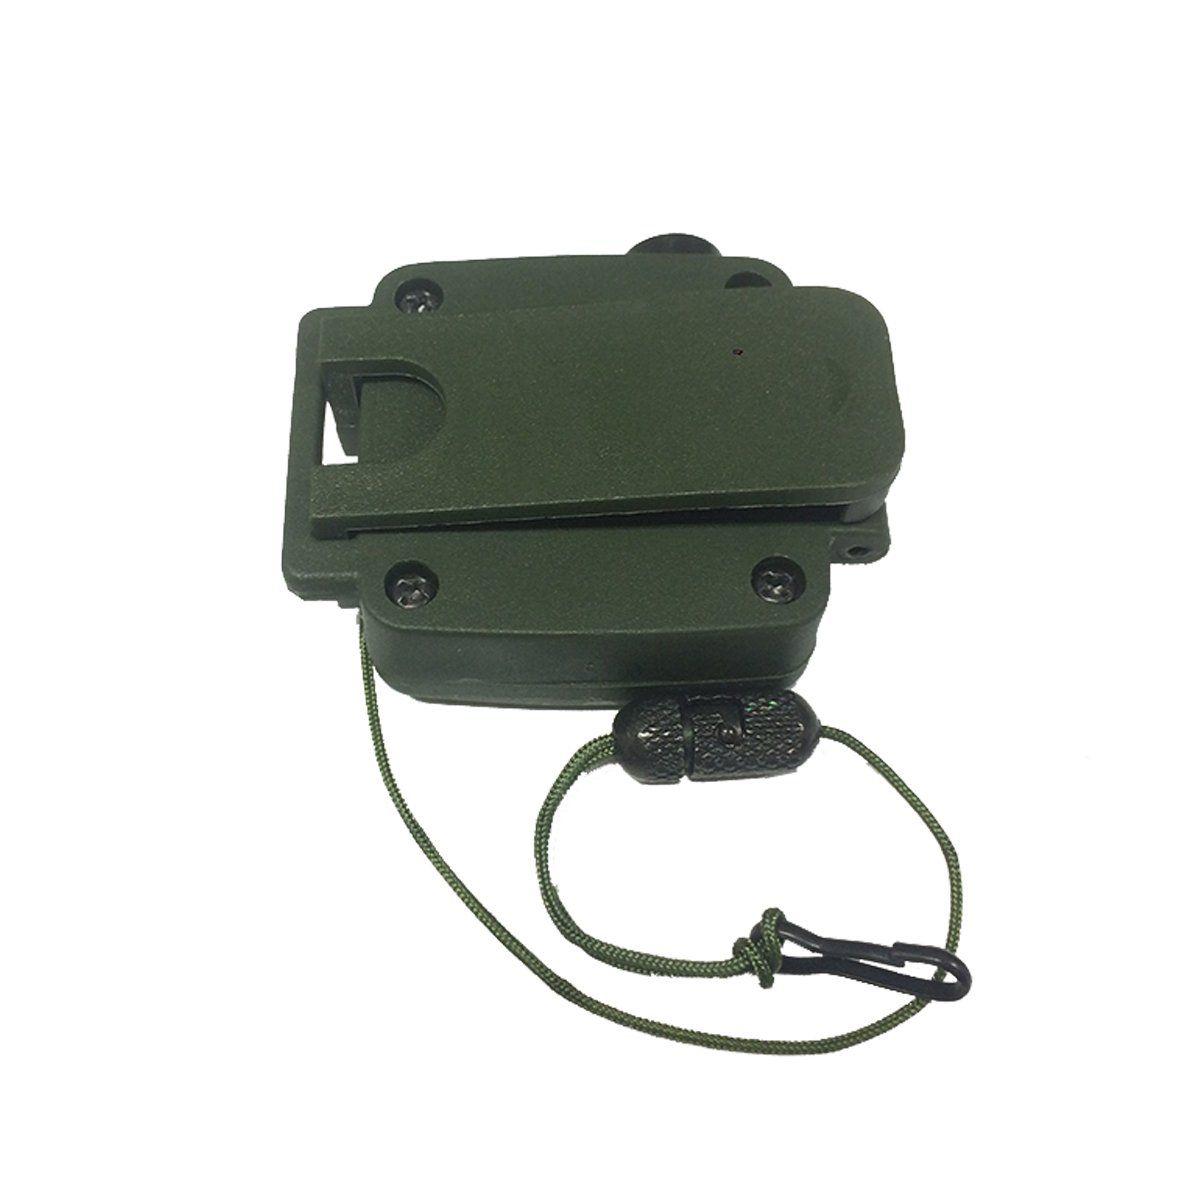 Fiel Retr?til P/ Pistola de Airsoft C/ Estrela Verde Bravo